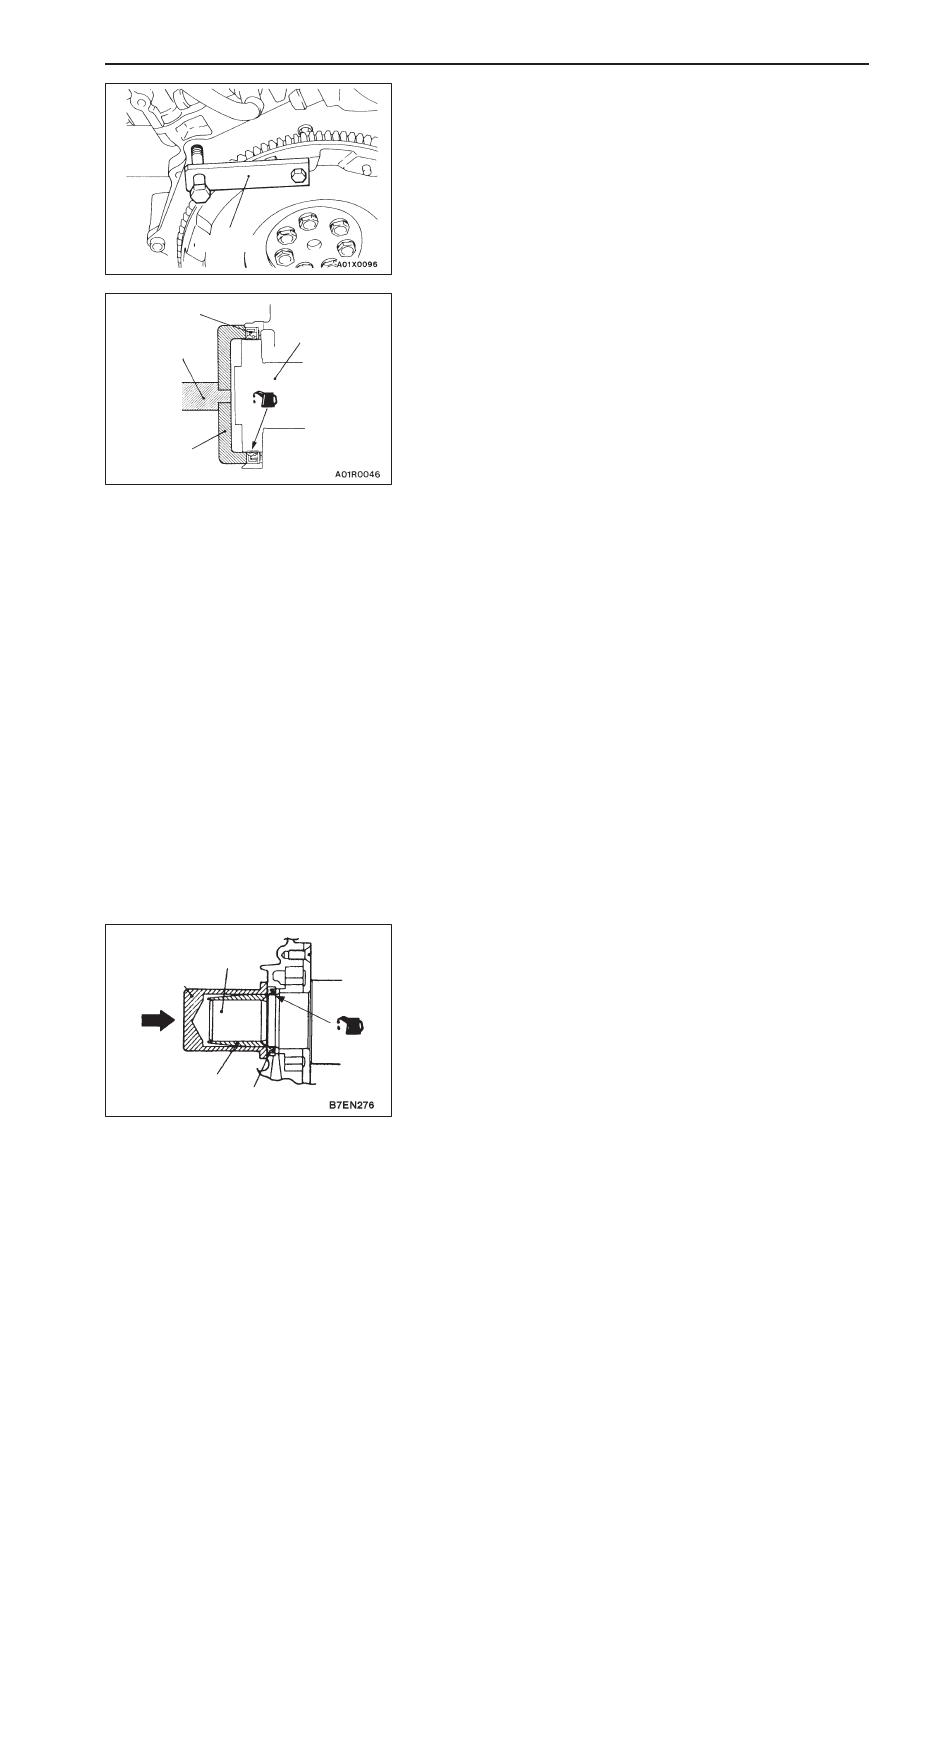 mitsubishi pajero pinin manual part 16 rh zinref ru